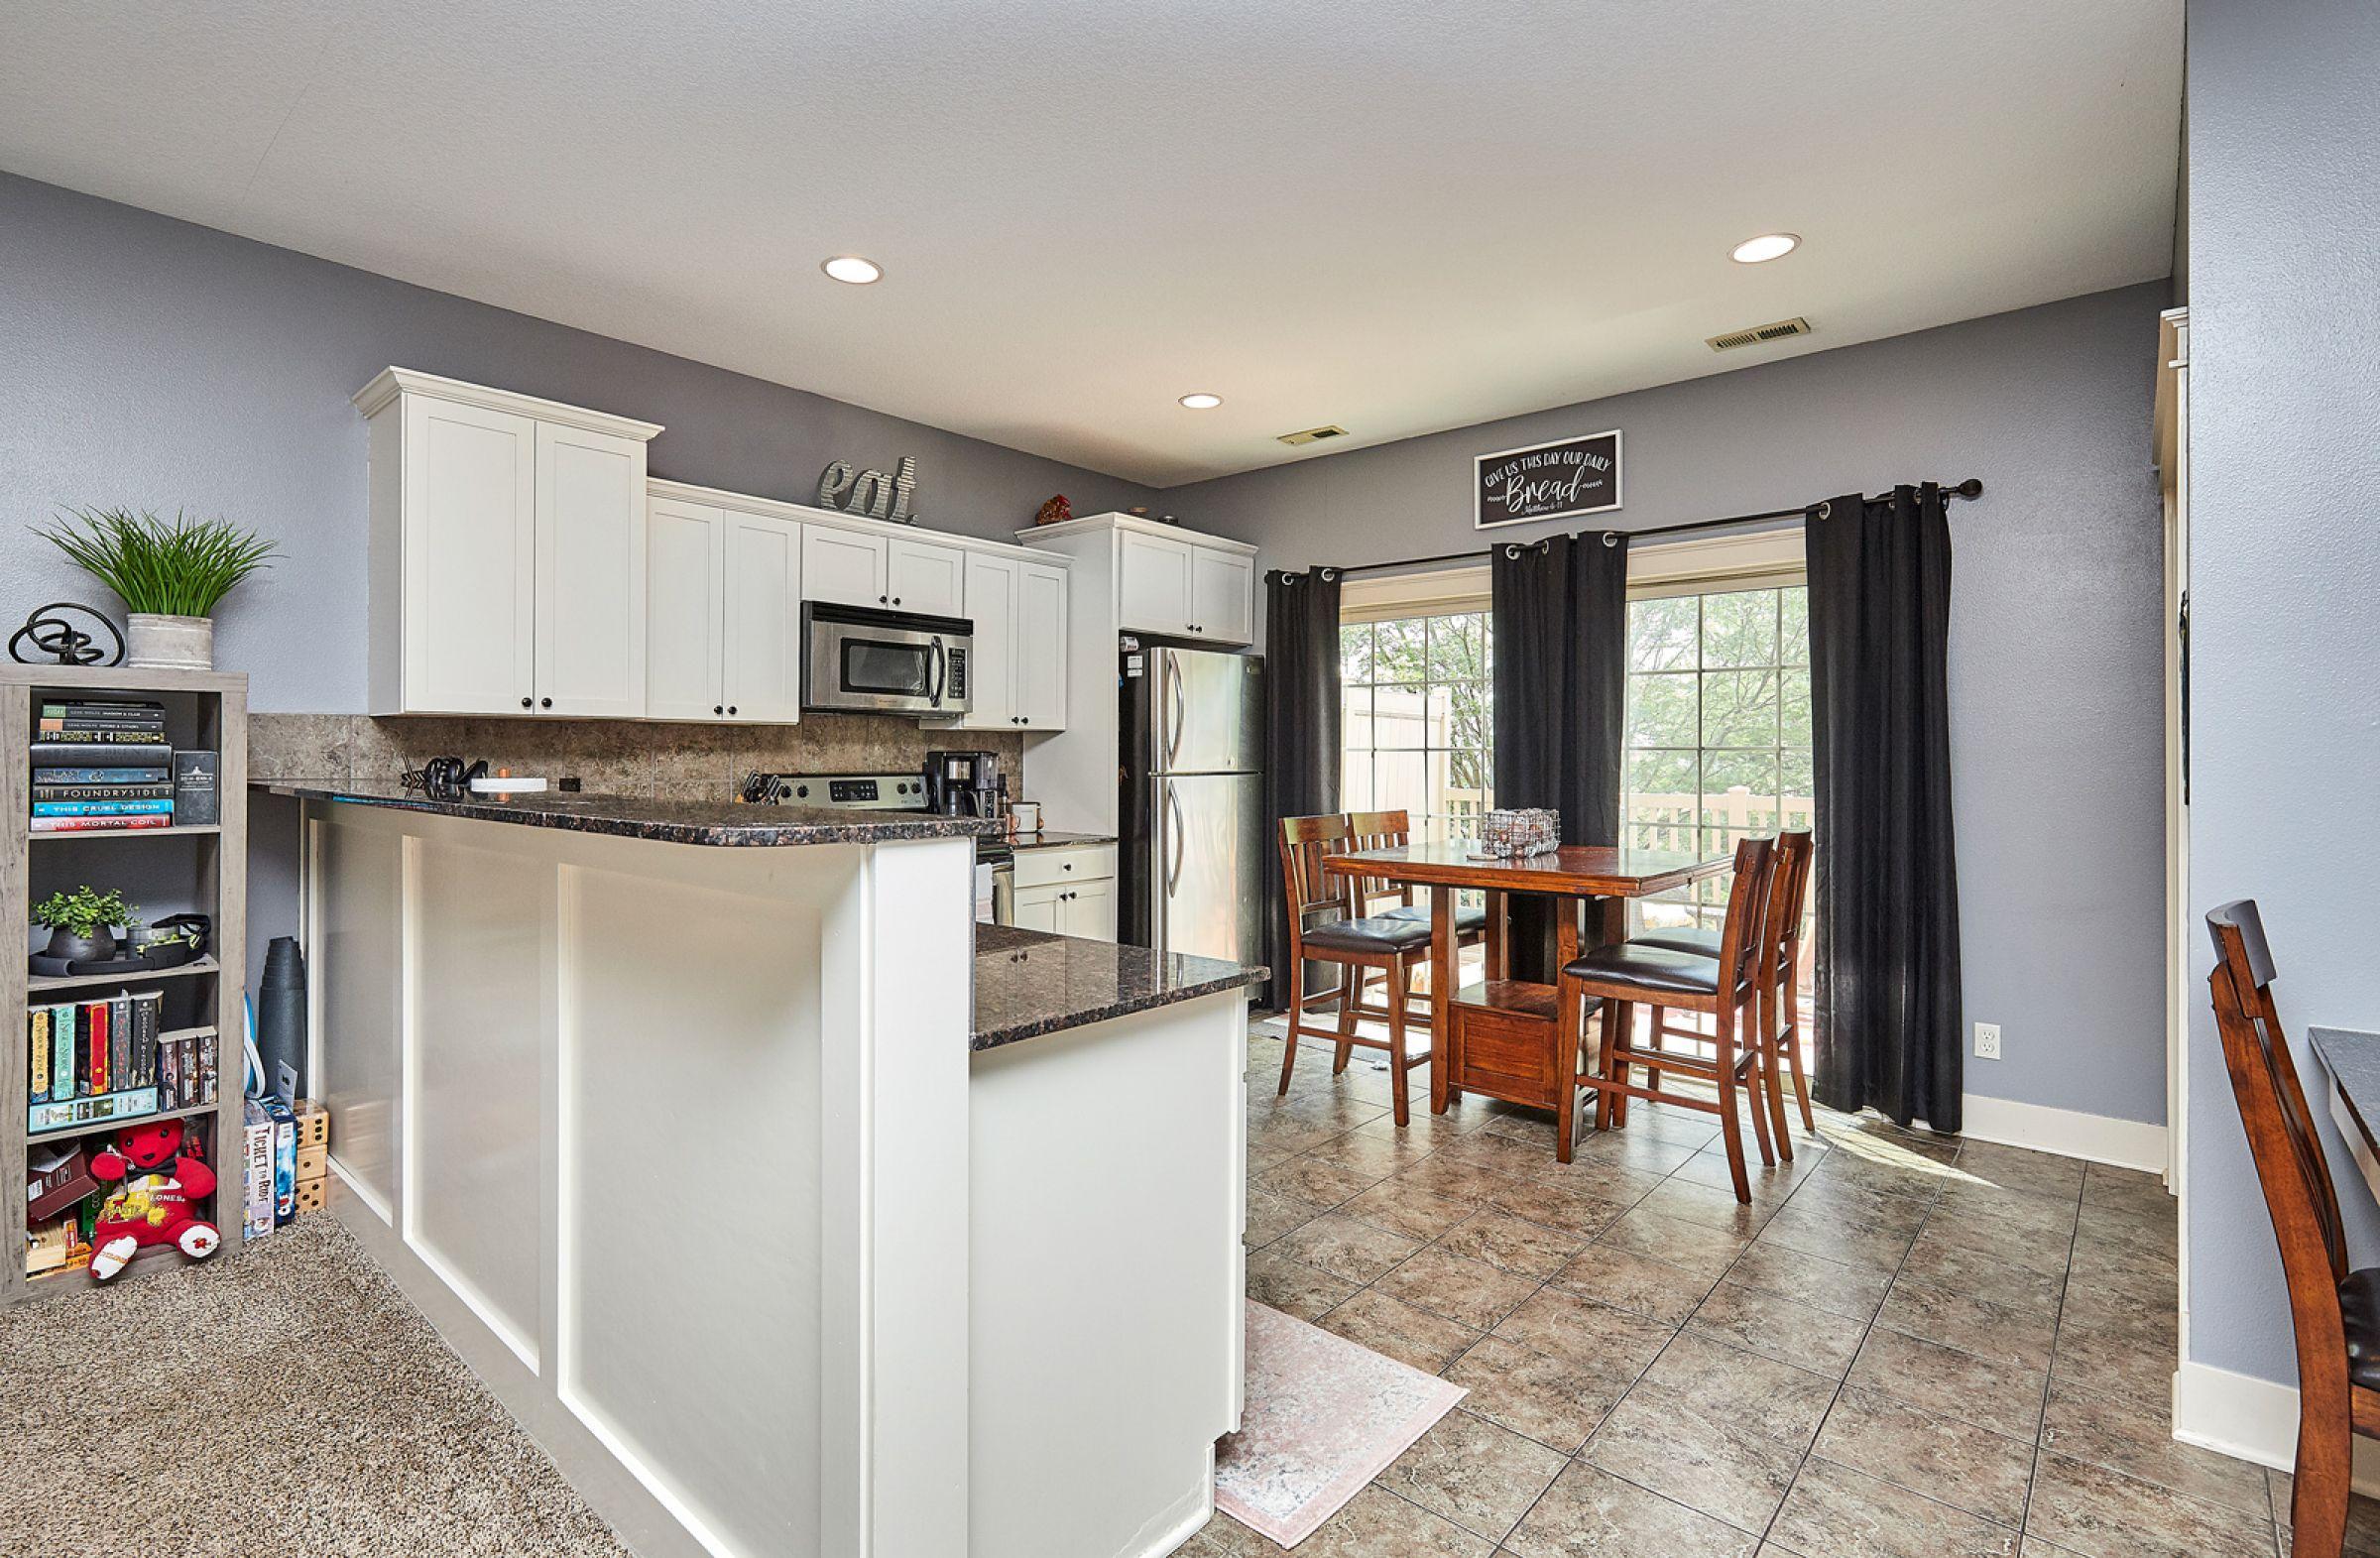 residential-polk-county-iowa-0-acres-listing-number-15662-1-2021-08-03-023439.jpg